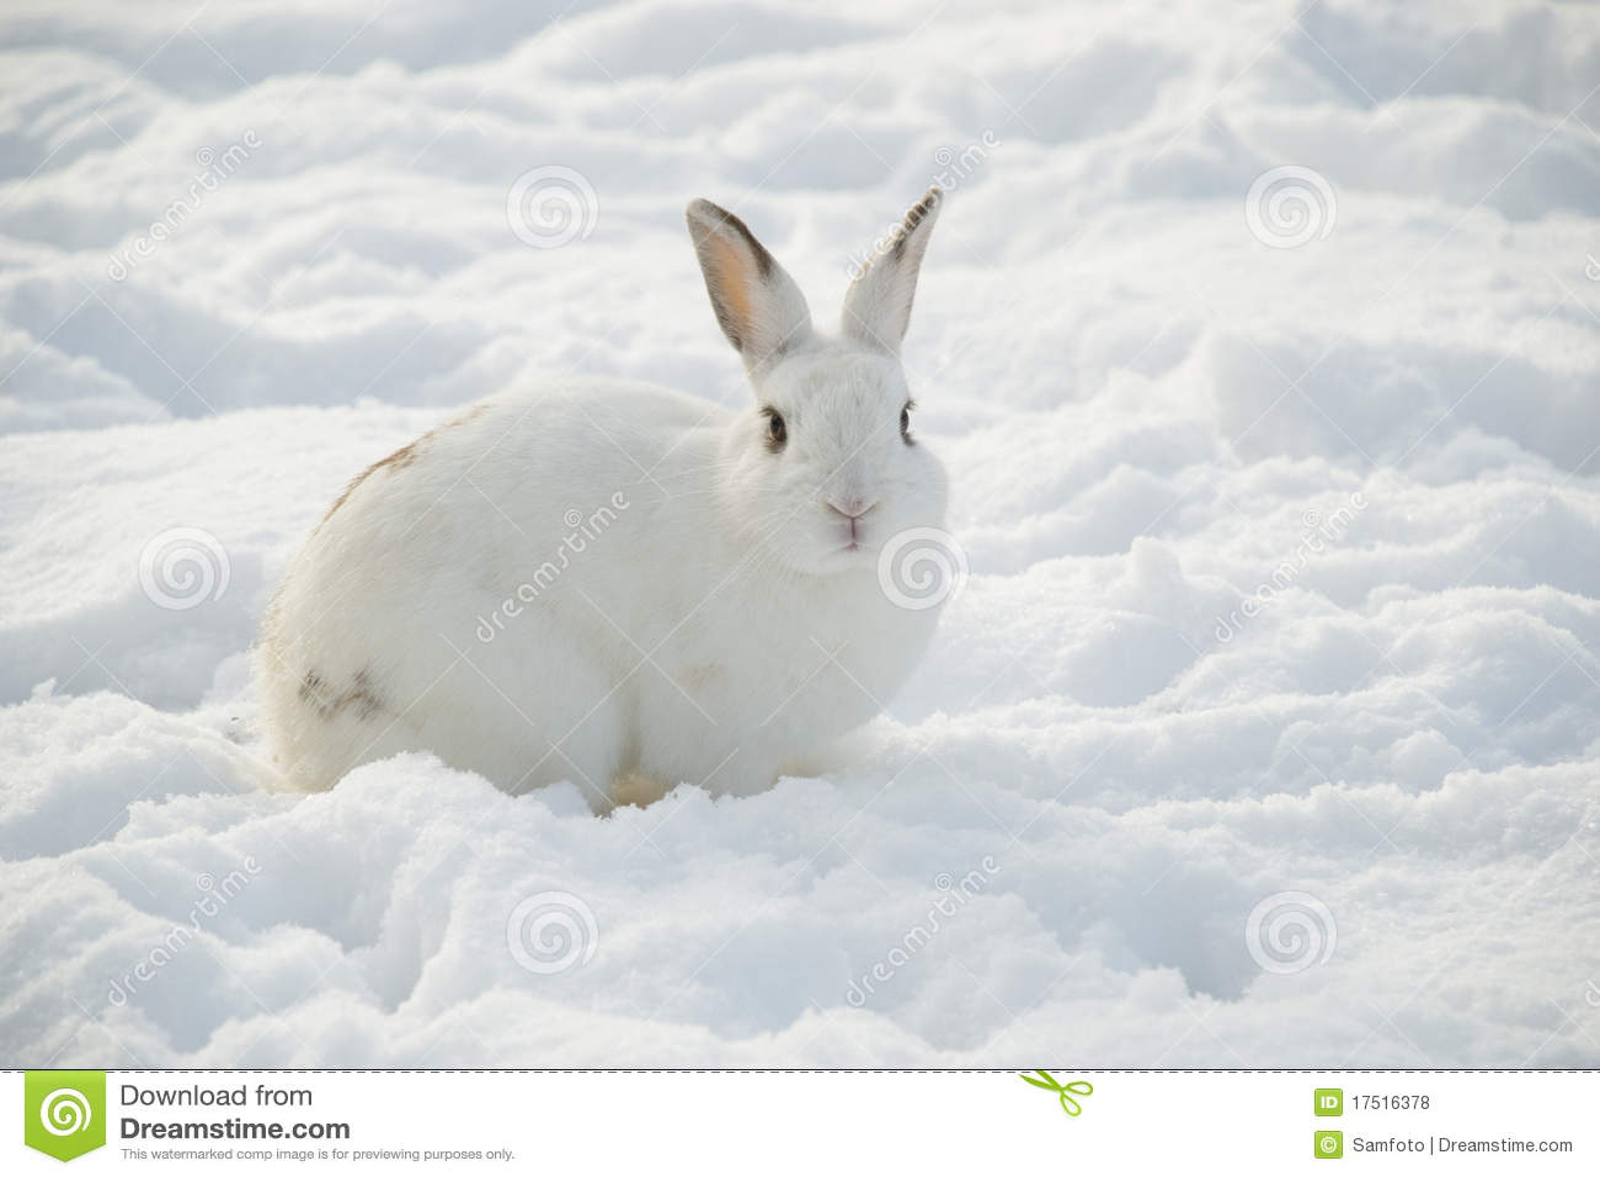 white rabbit in snow royalty free stock photos image